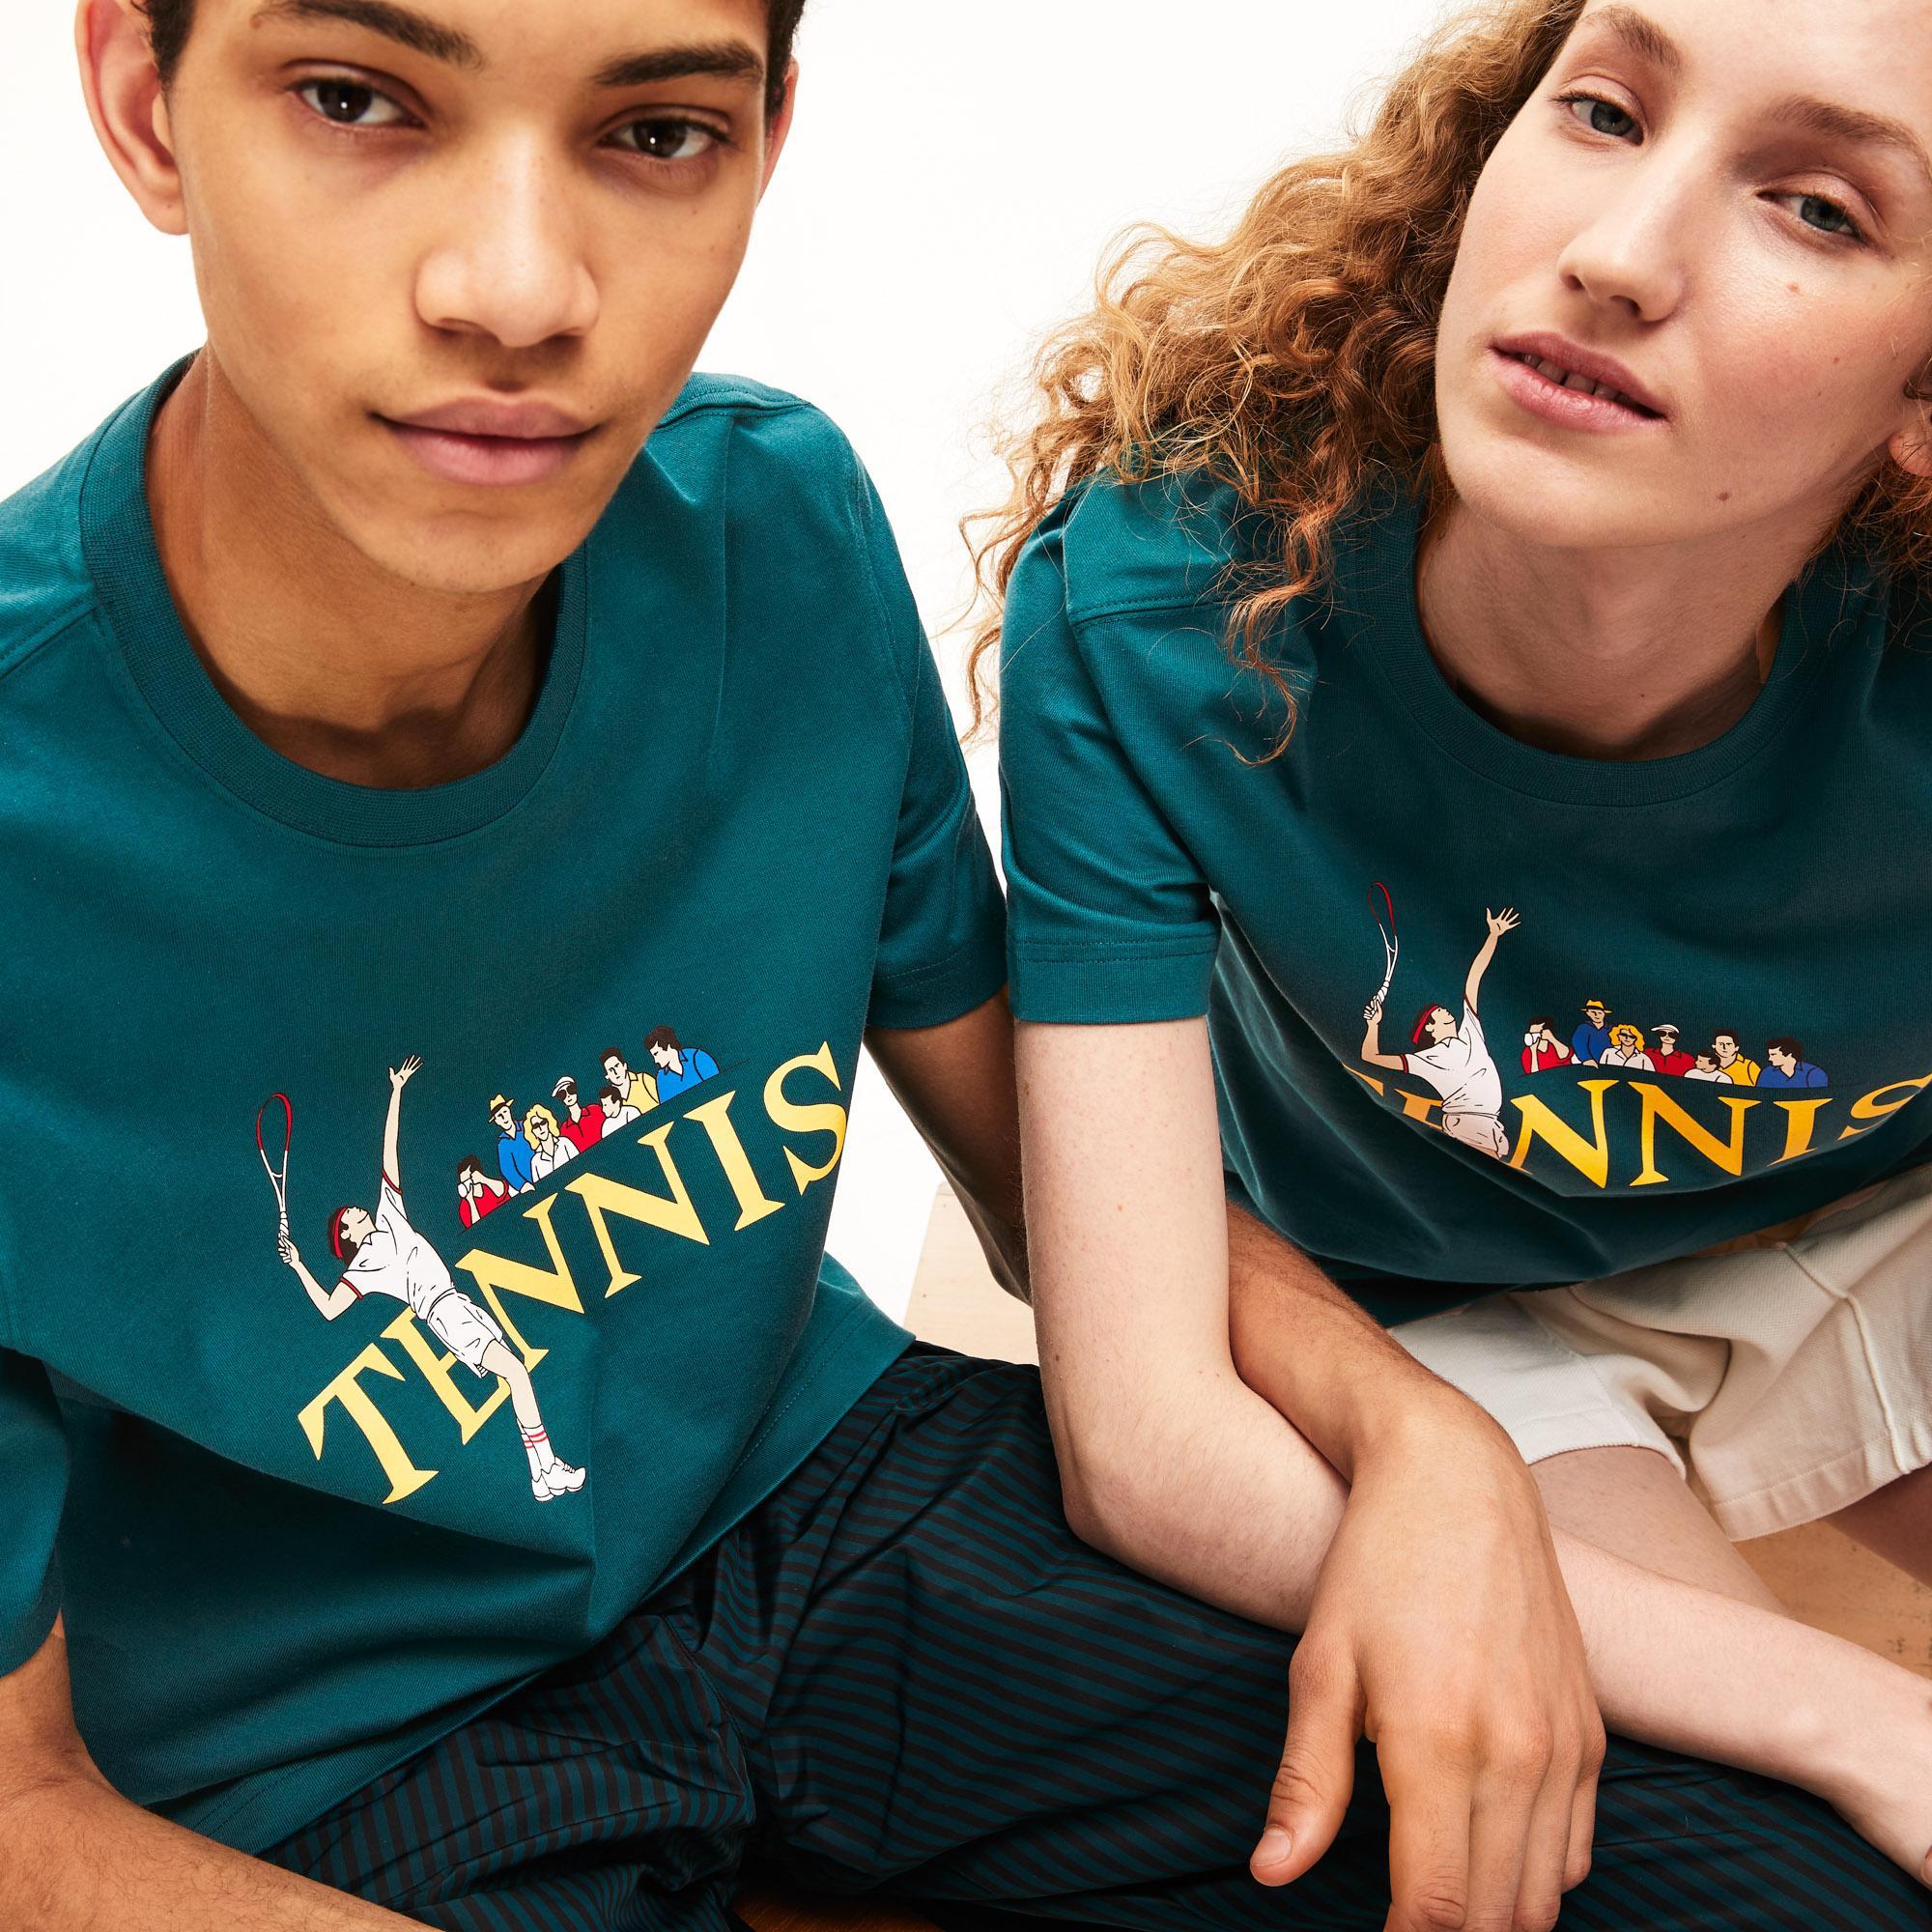 Lacoste LIVE Bawełniany T-Shirt Unisex Do Gry W Tenisa